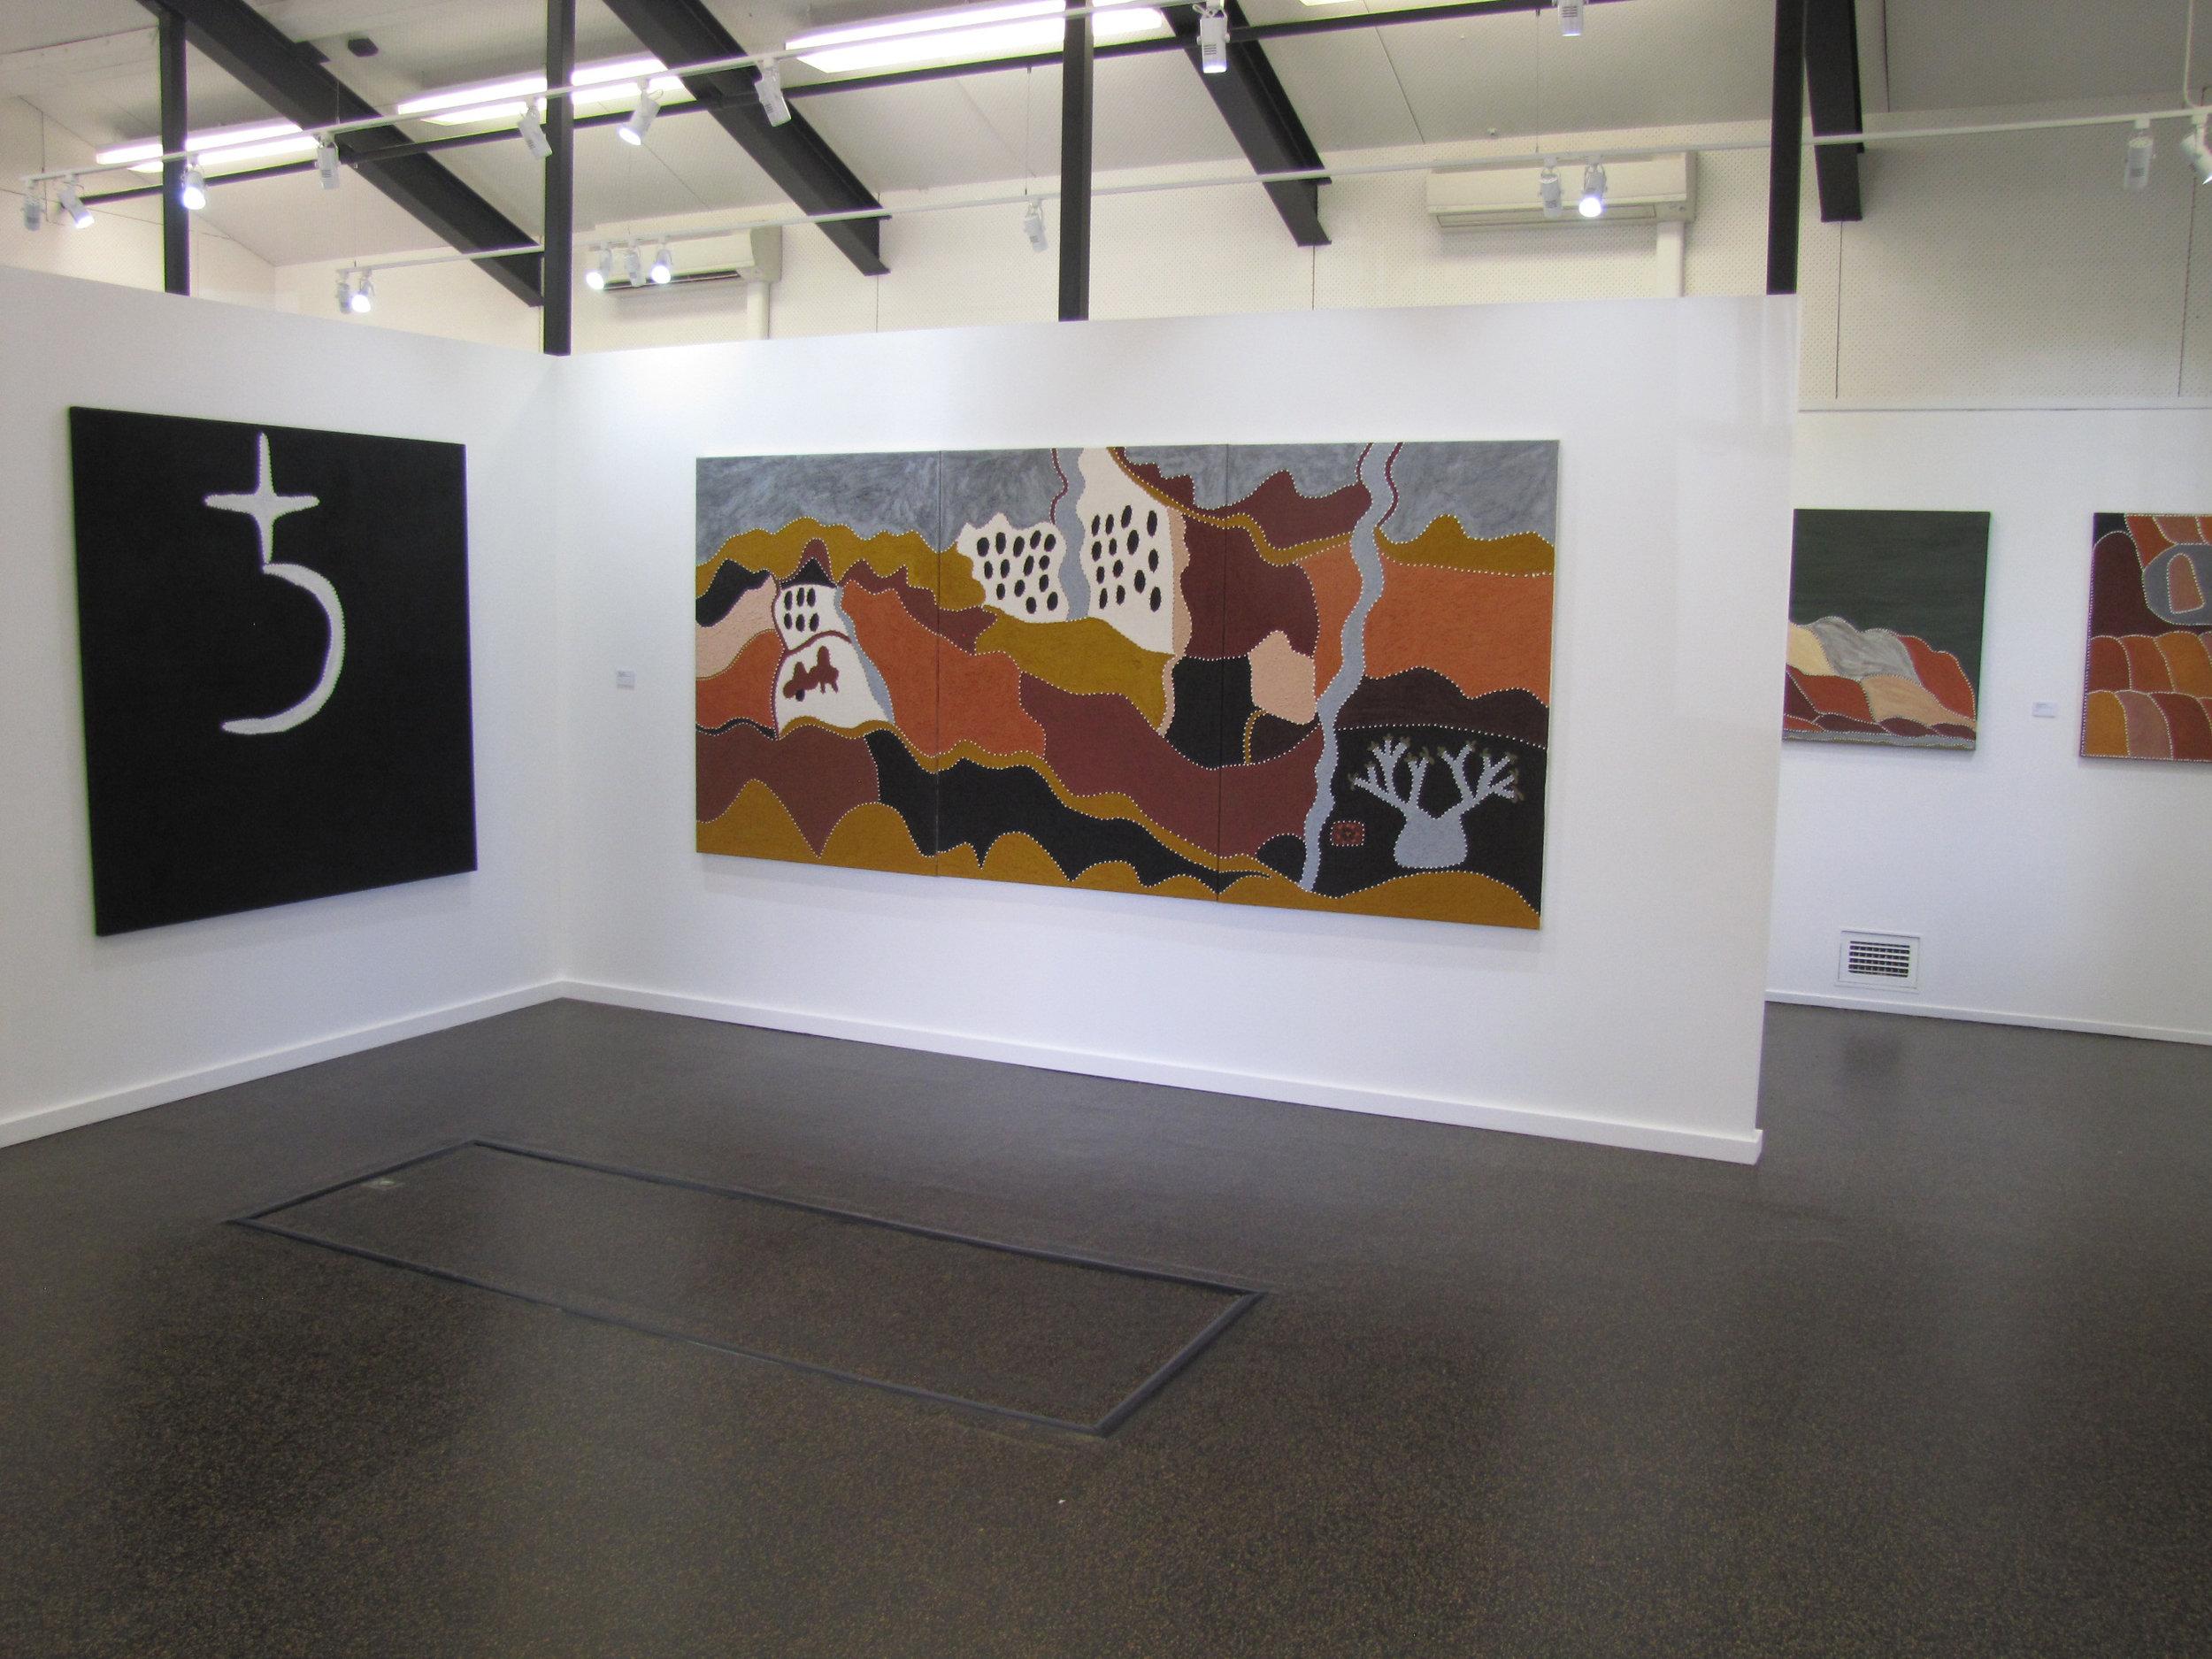 NSG. Warmun 5 exhibition. Exhibition views 7.jpg